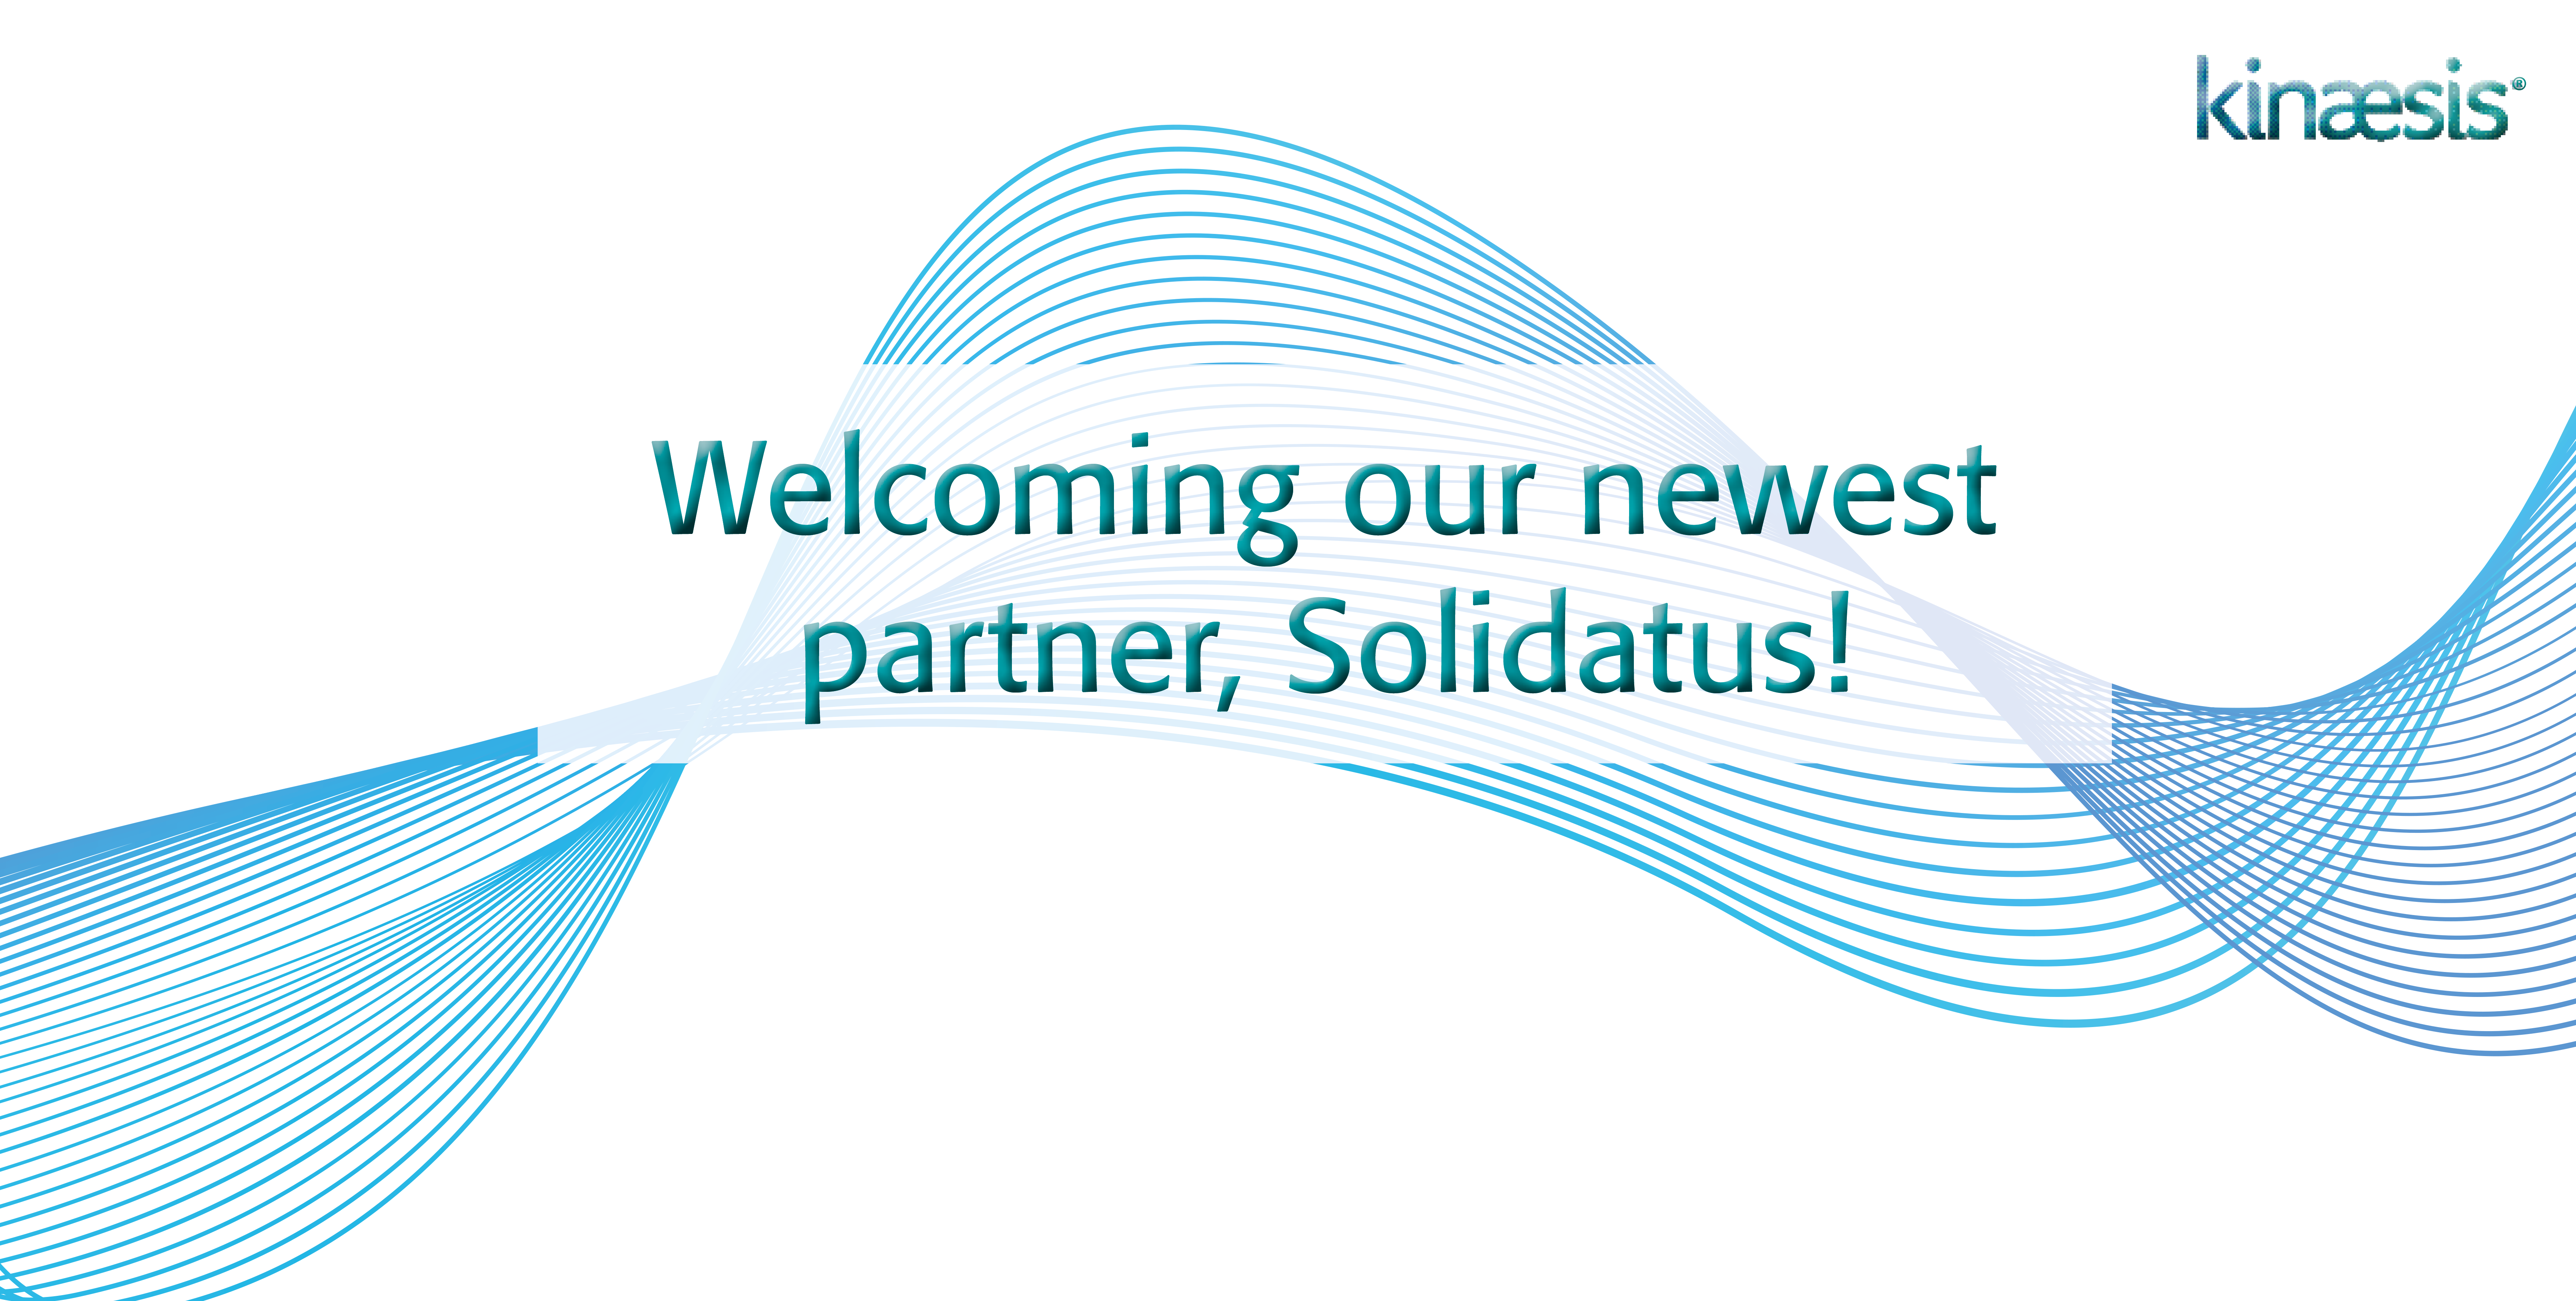 News: Solidatus Partnership